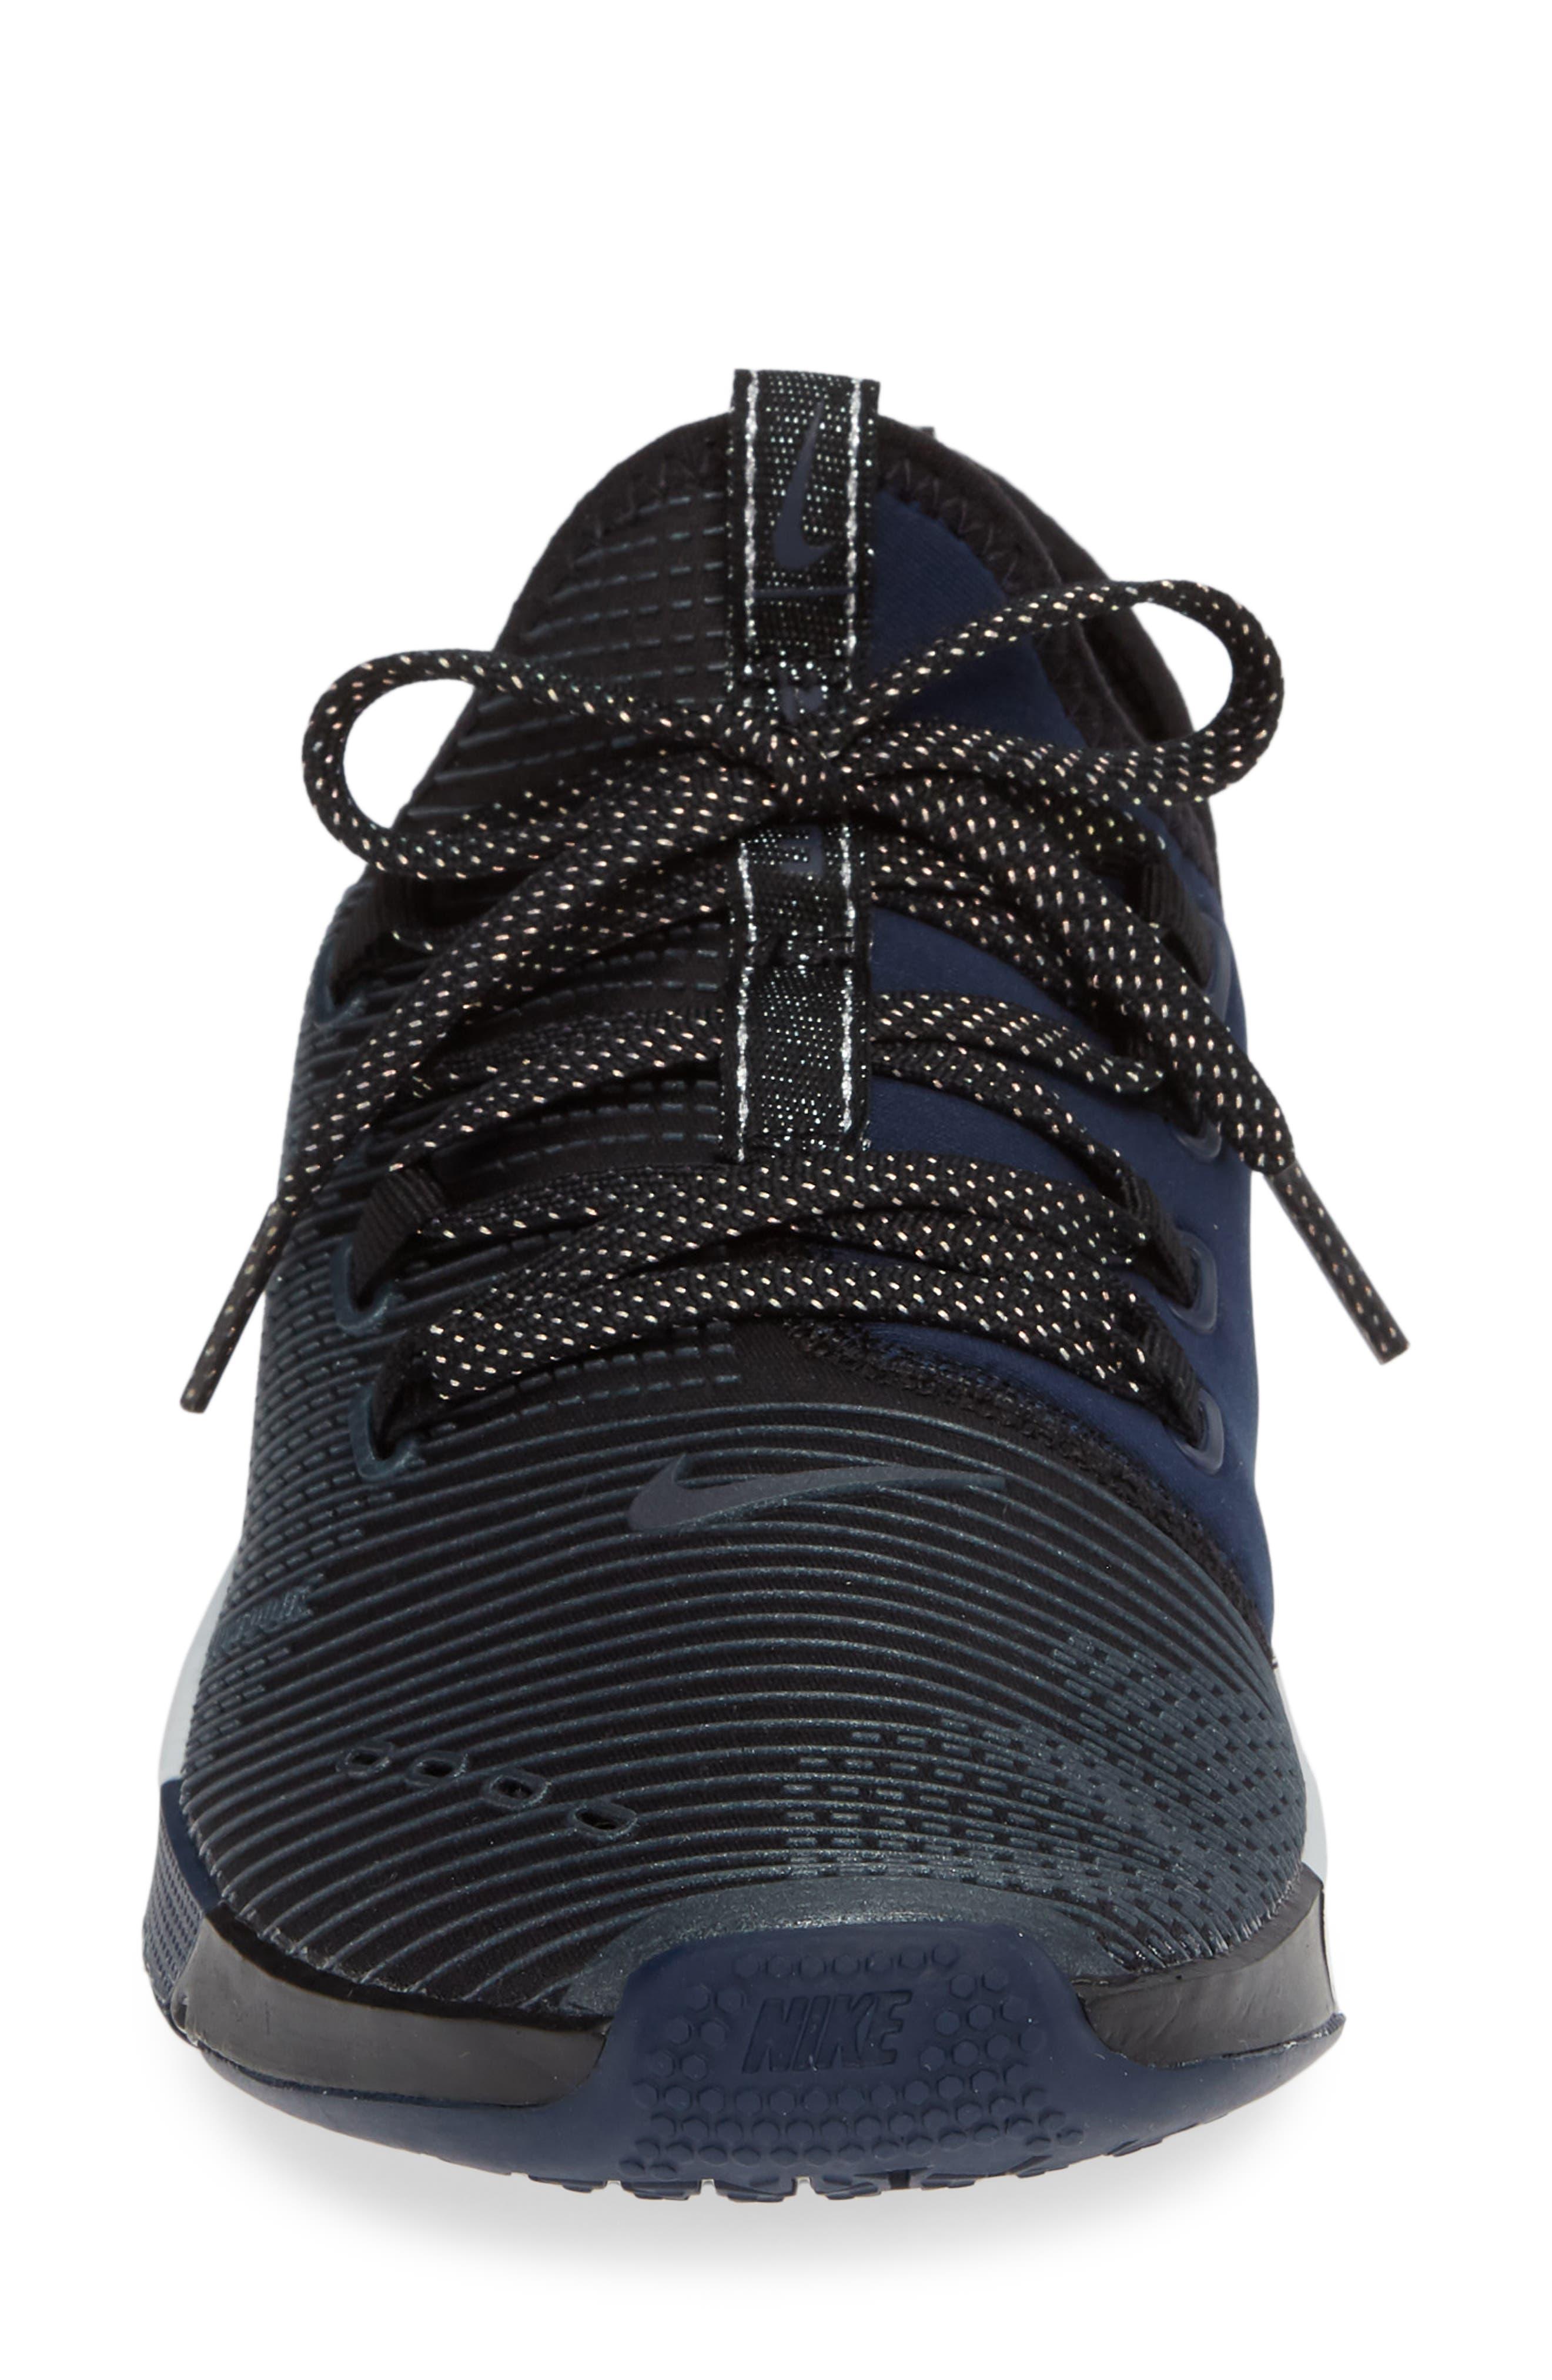 NIKE,                             Air Zoom Elevate Training Shoe,                             Alternate thumbnail 4, color,                             BLACK/ METALLIC NAVY- NAVY